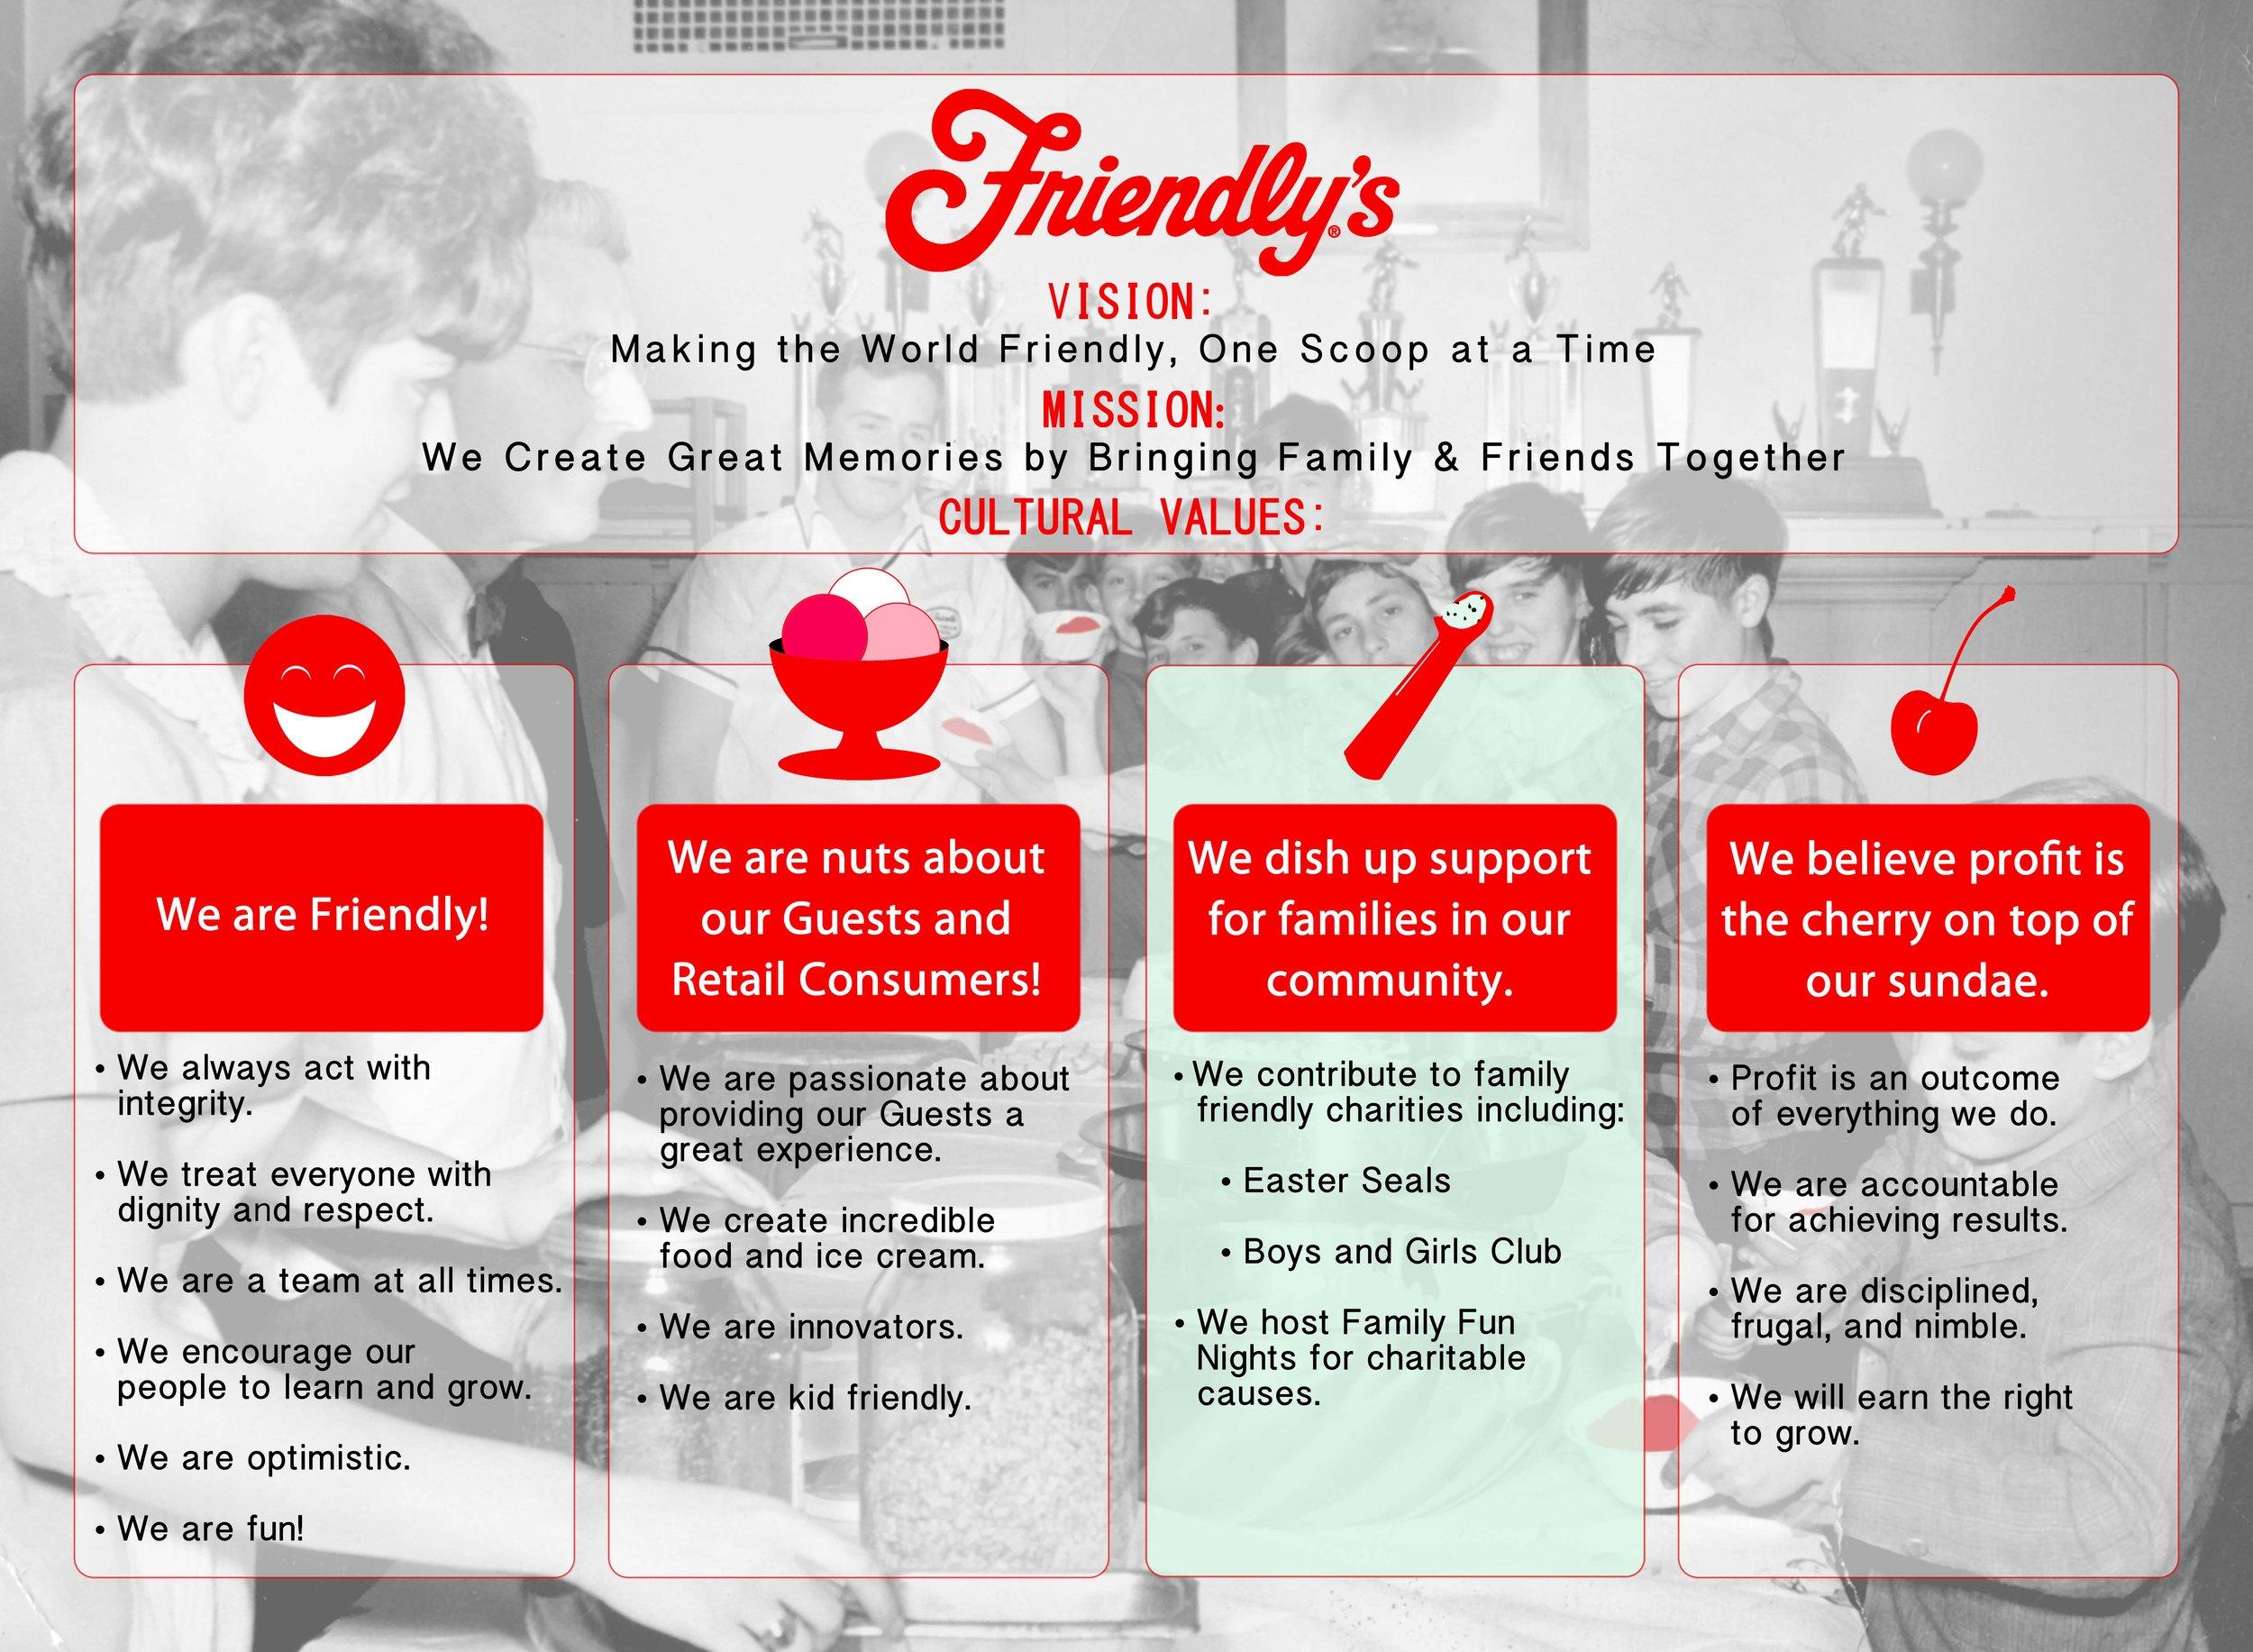 Friendlys Mission-Vision Statement_updated2_printready.jpg